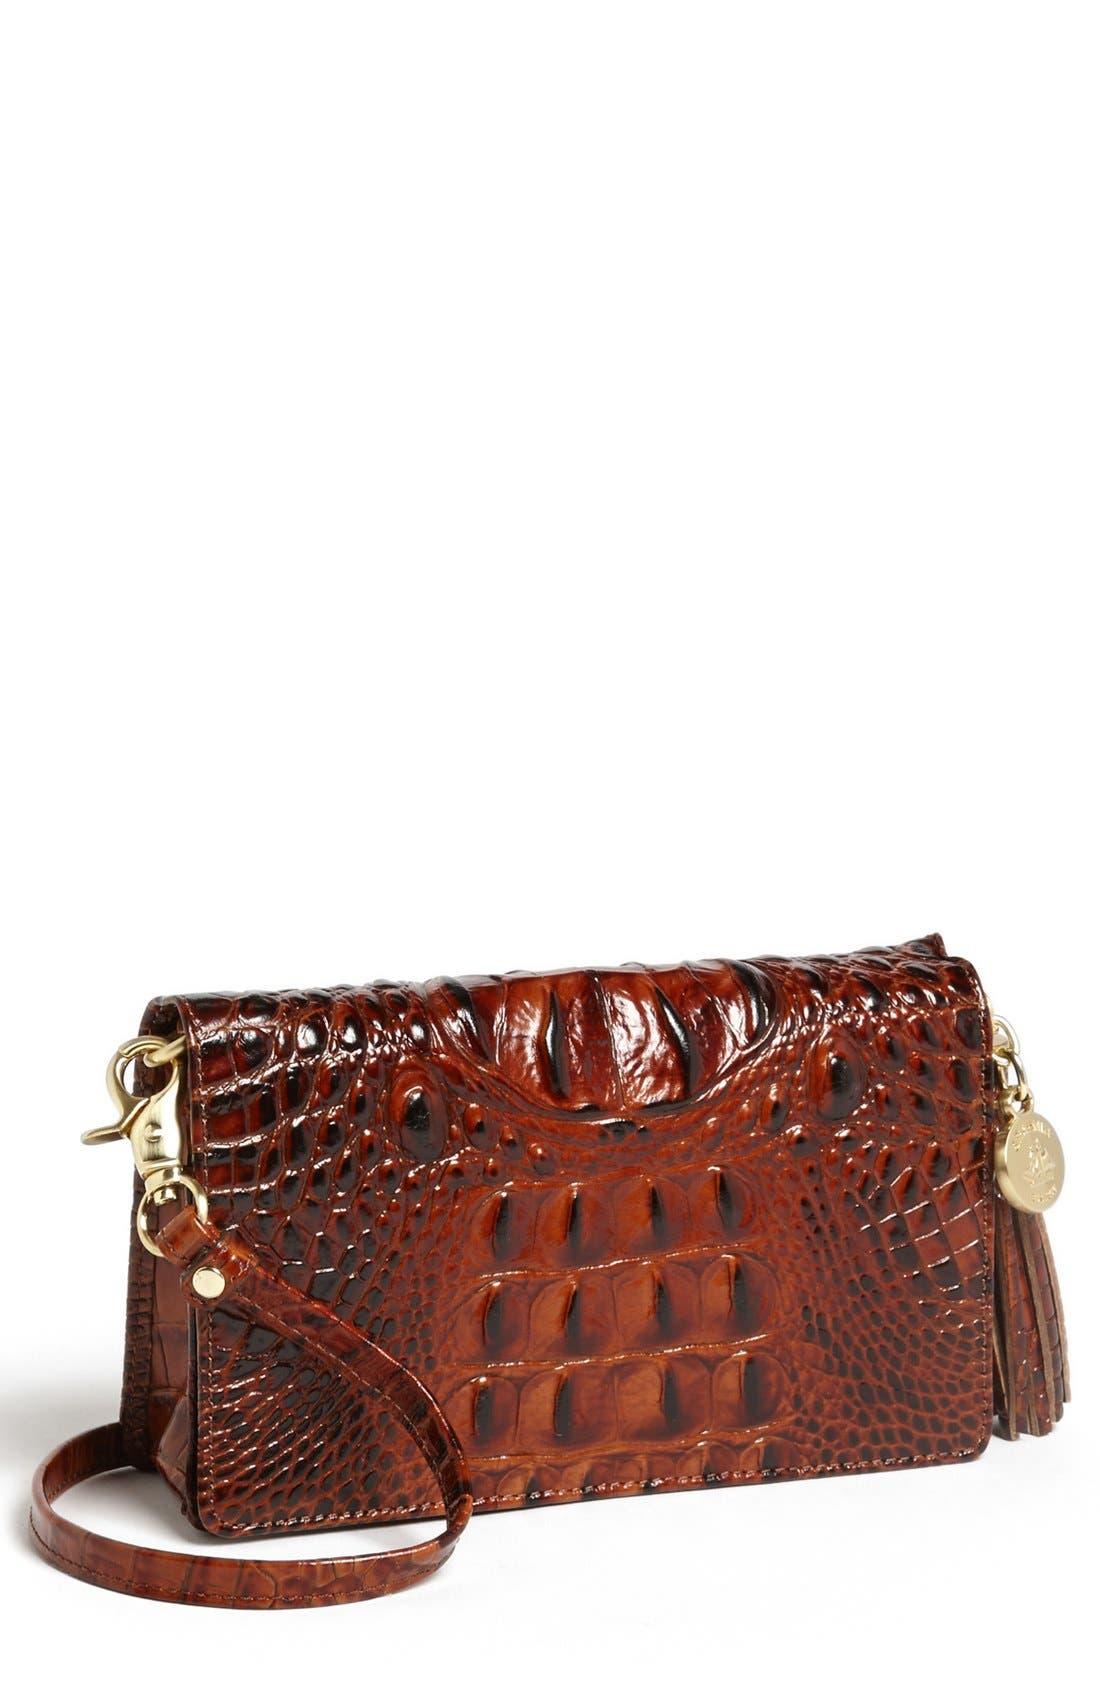 Alternate Image 1 Selected - Brahmin 'Melbourne - Amelia' Croc Embossed Leather Crossbody Clutch